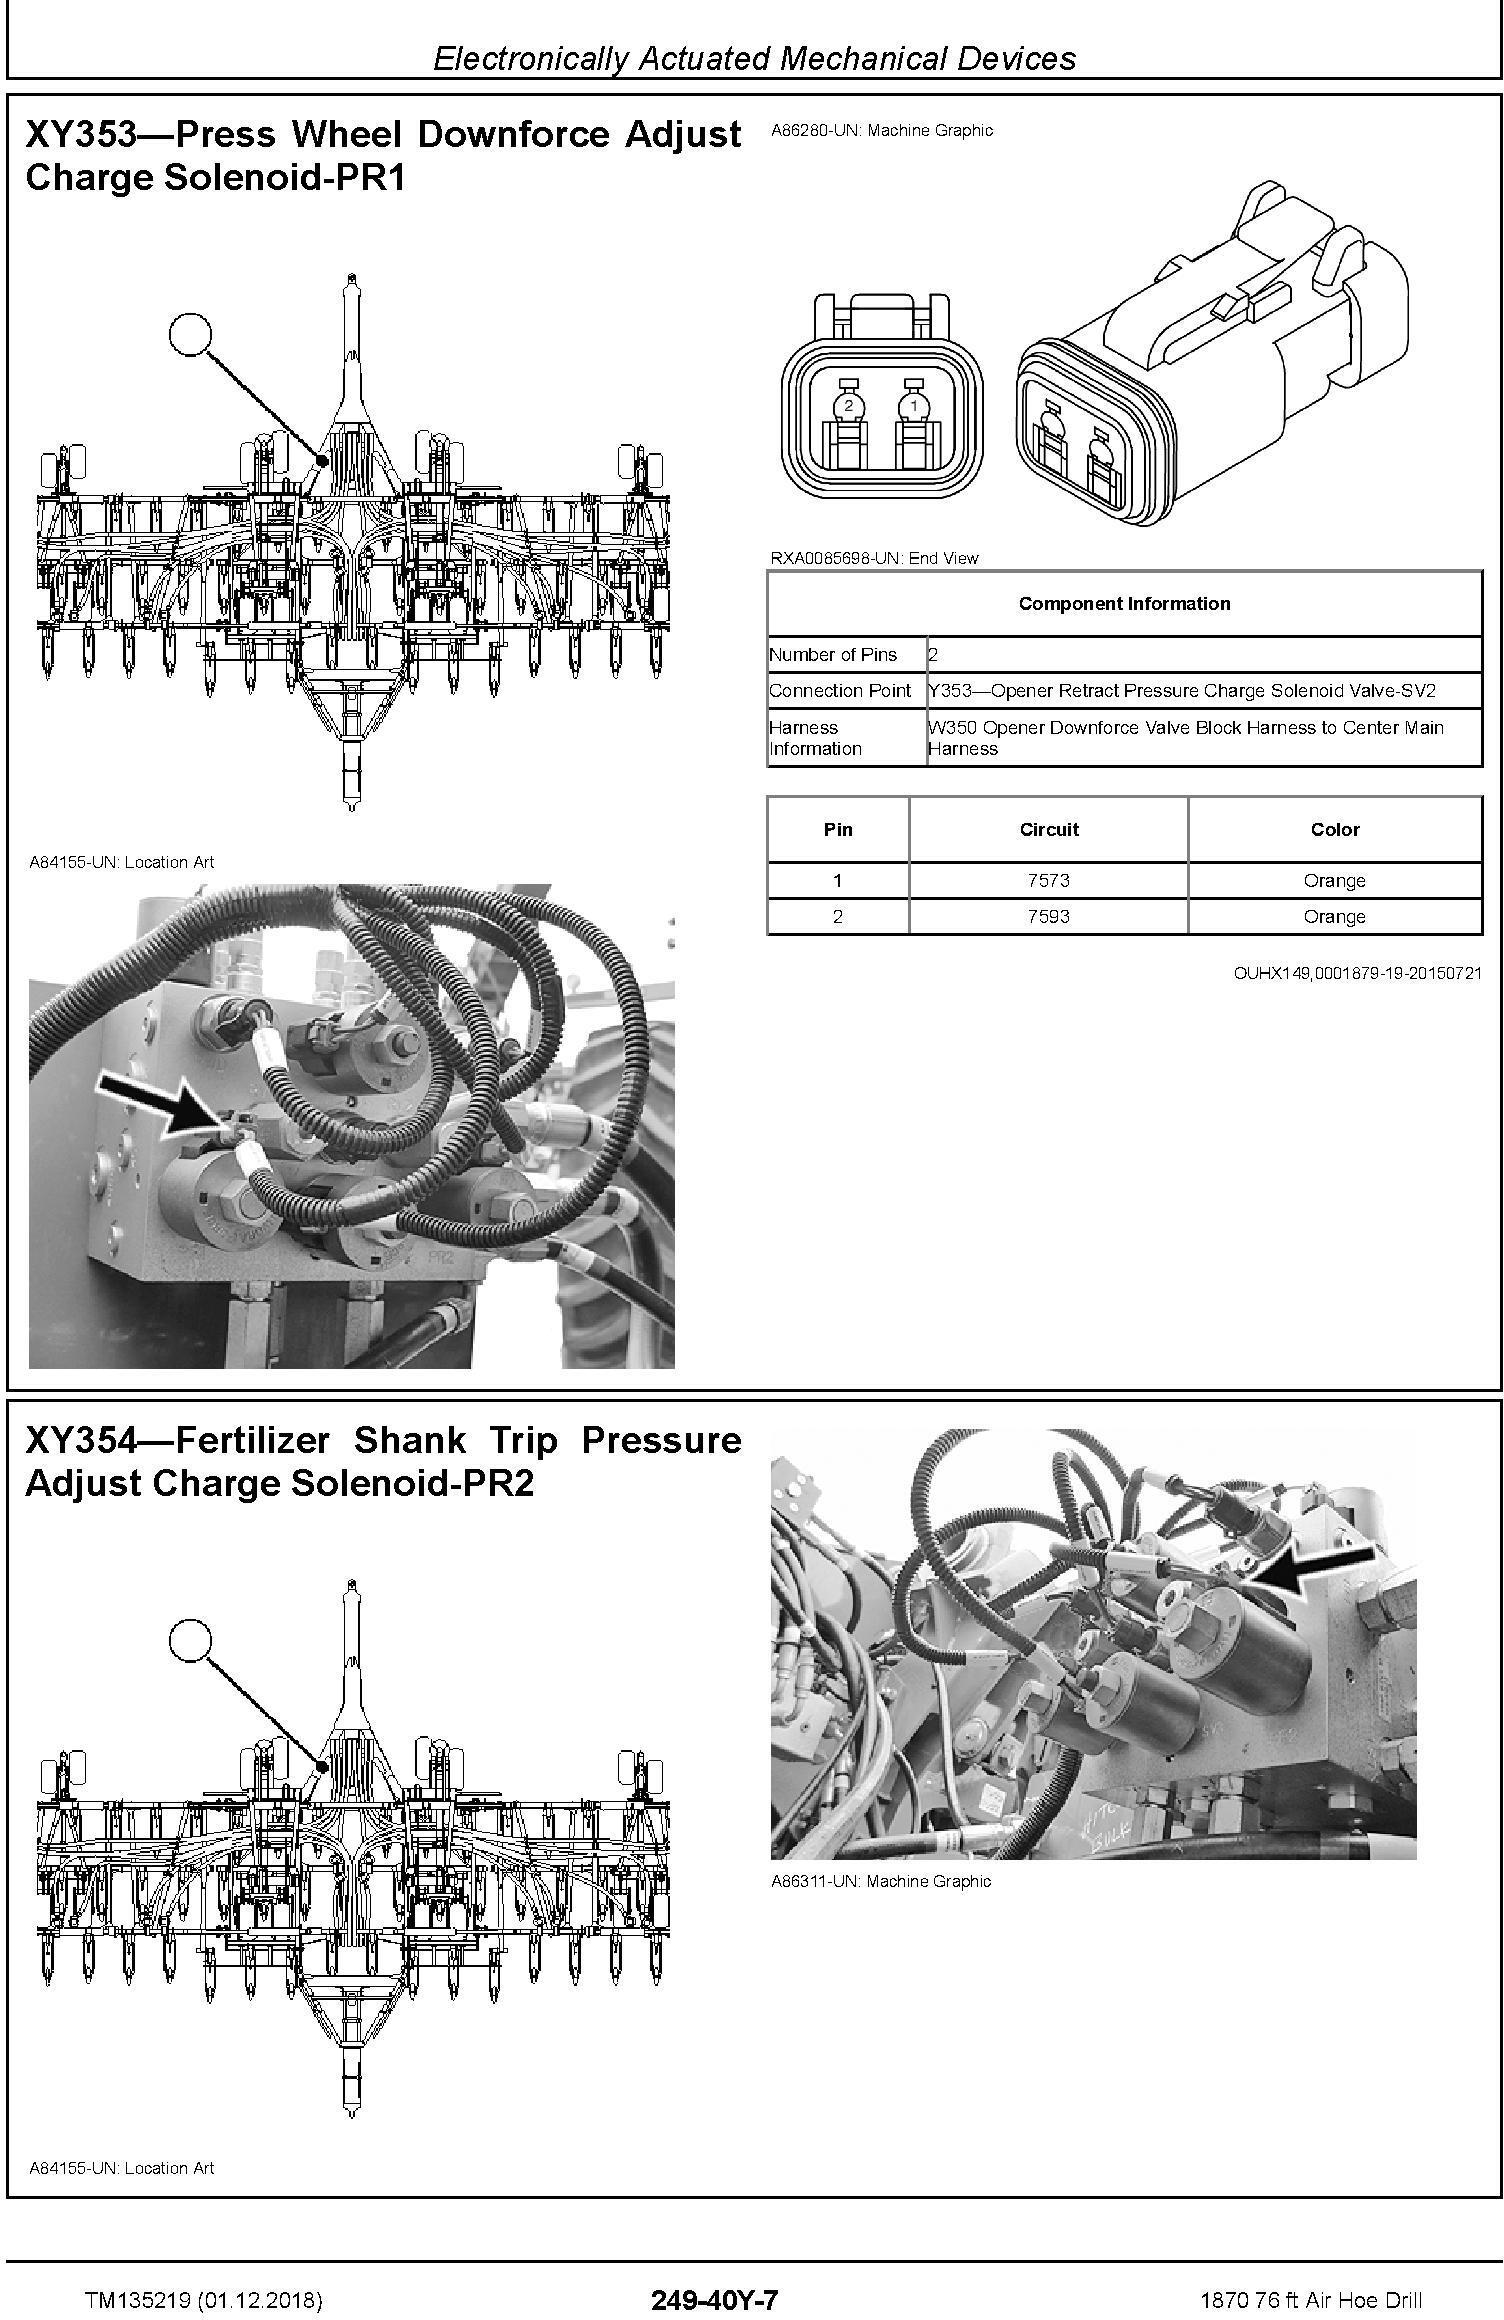 JD John Deere 1870 76 ft Air Hoe Drill Diagnostic Technical Service Manual (TM135219) - 1